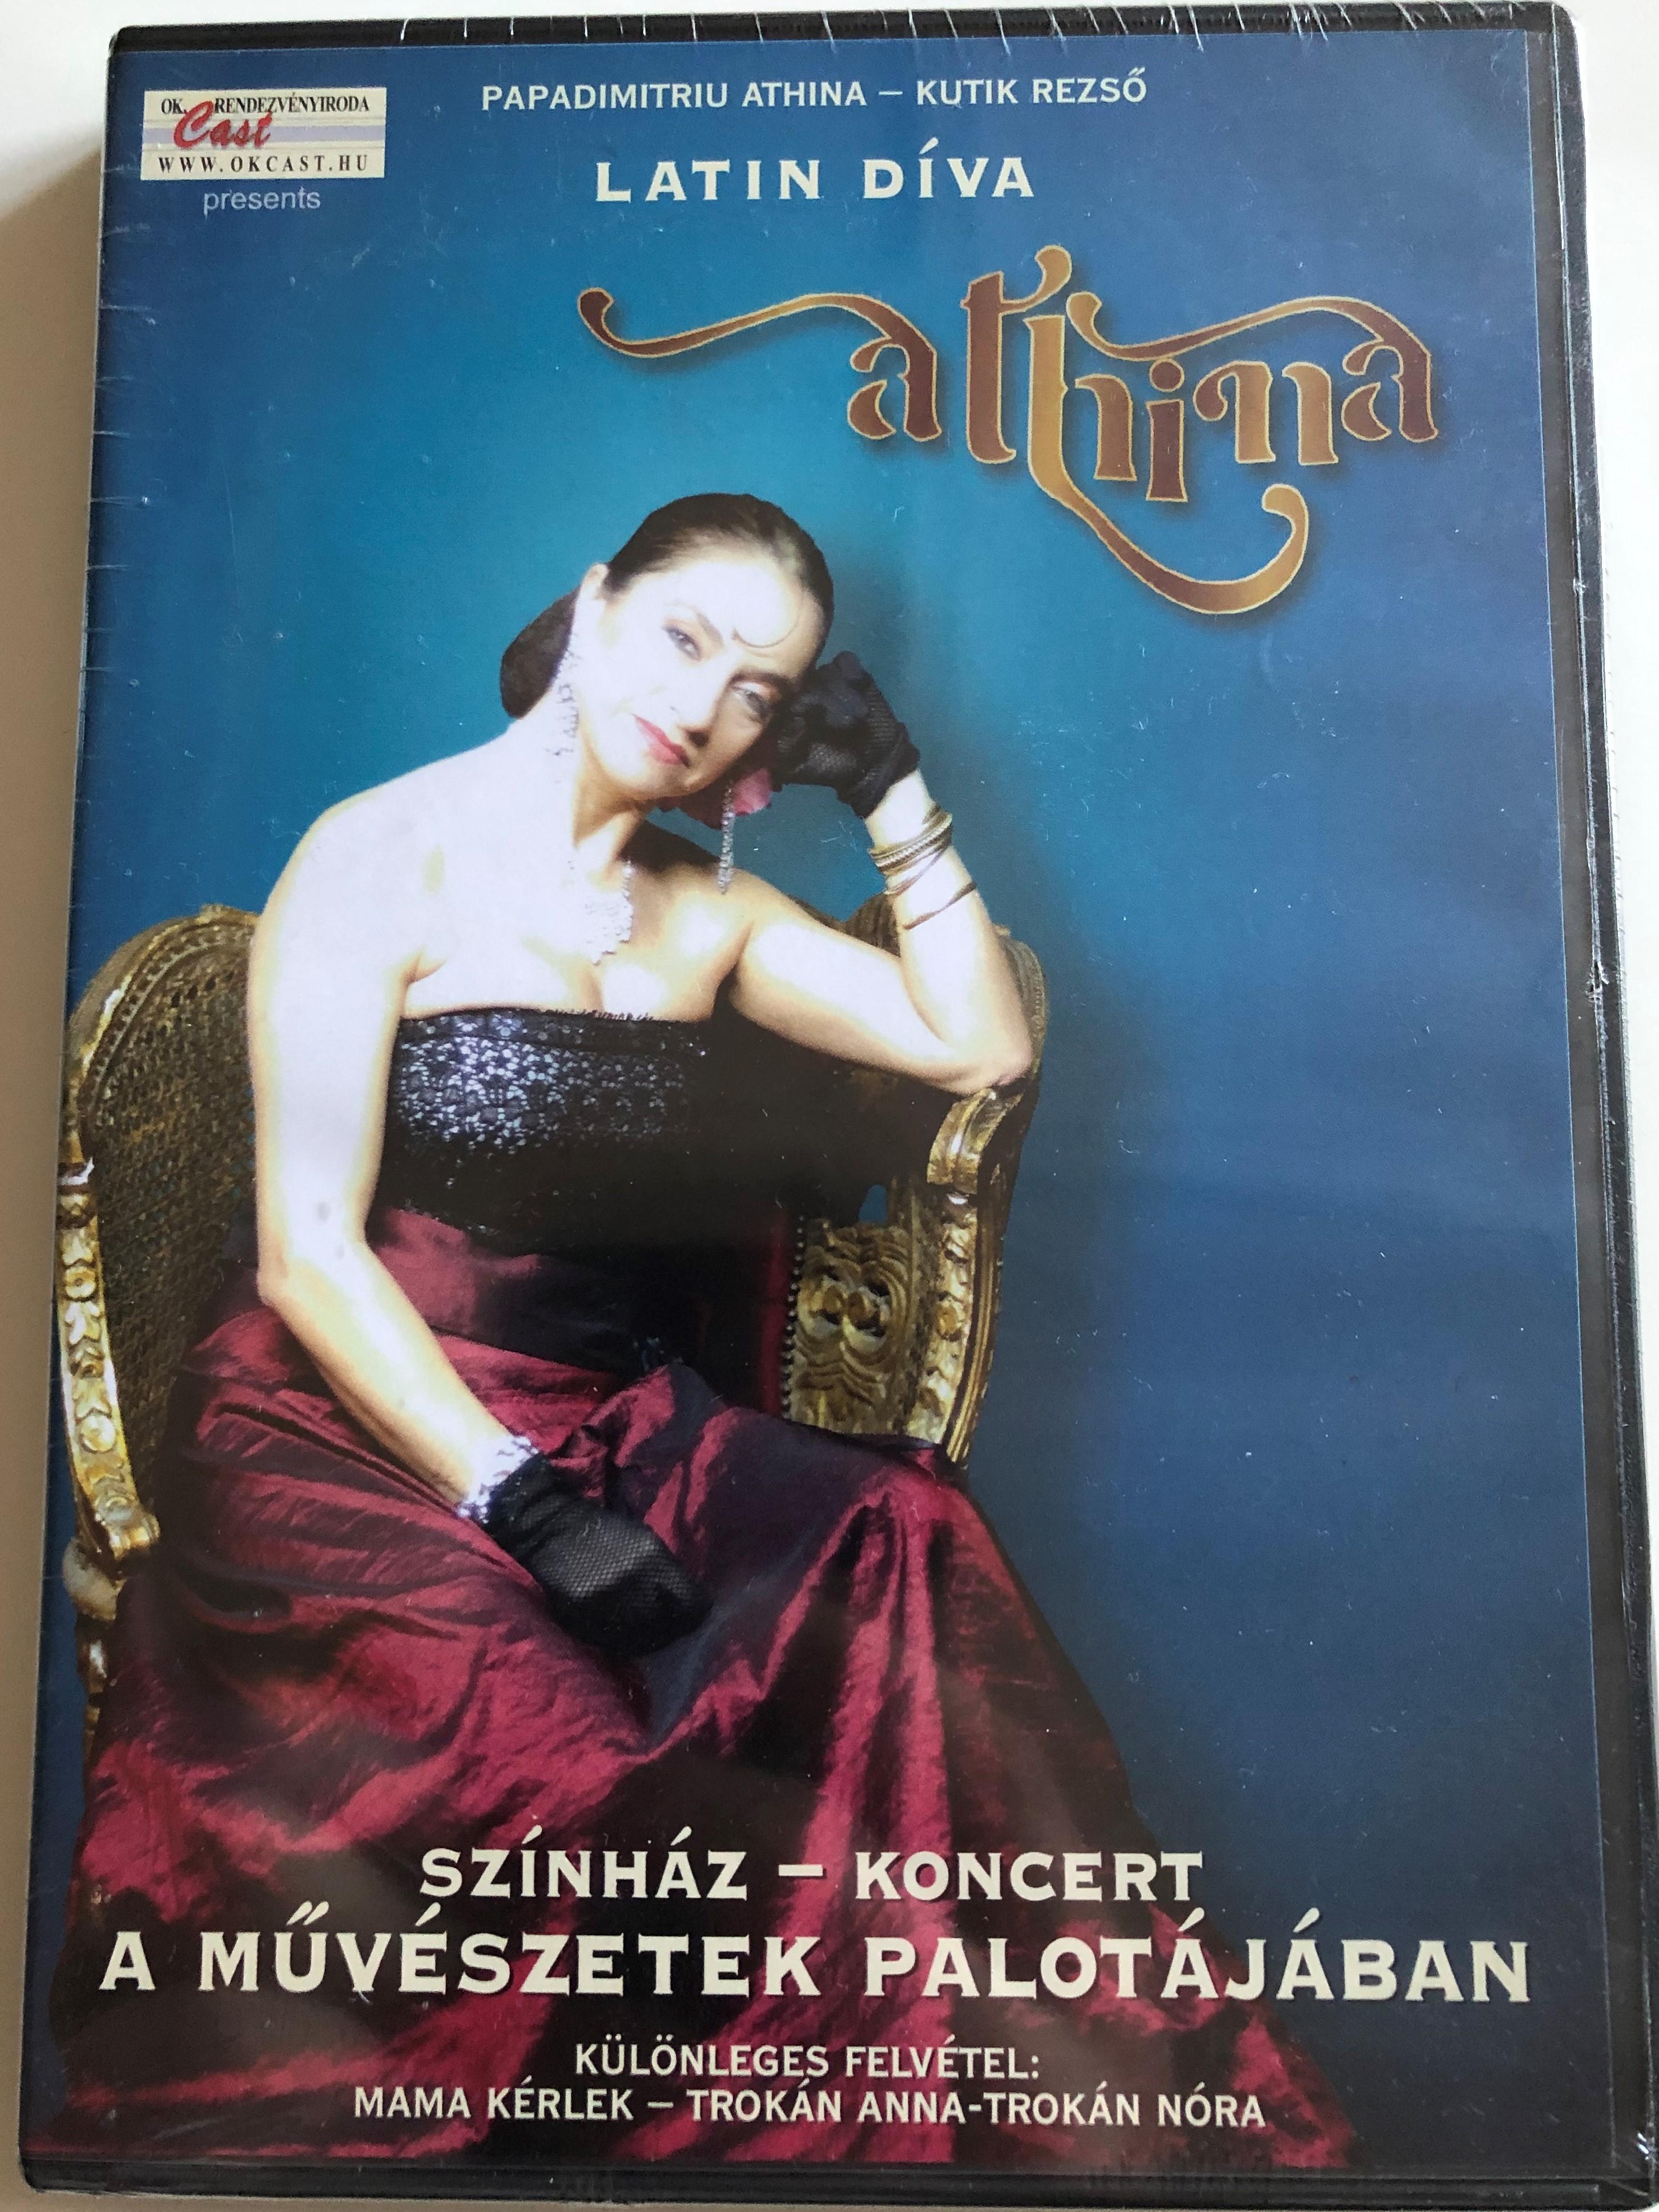 athina-latin-d-va-dvd-2010-papadimitriu-athina-kutik-rezs-1.jpg